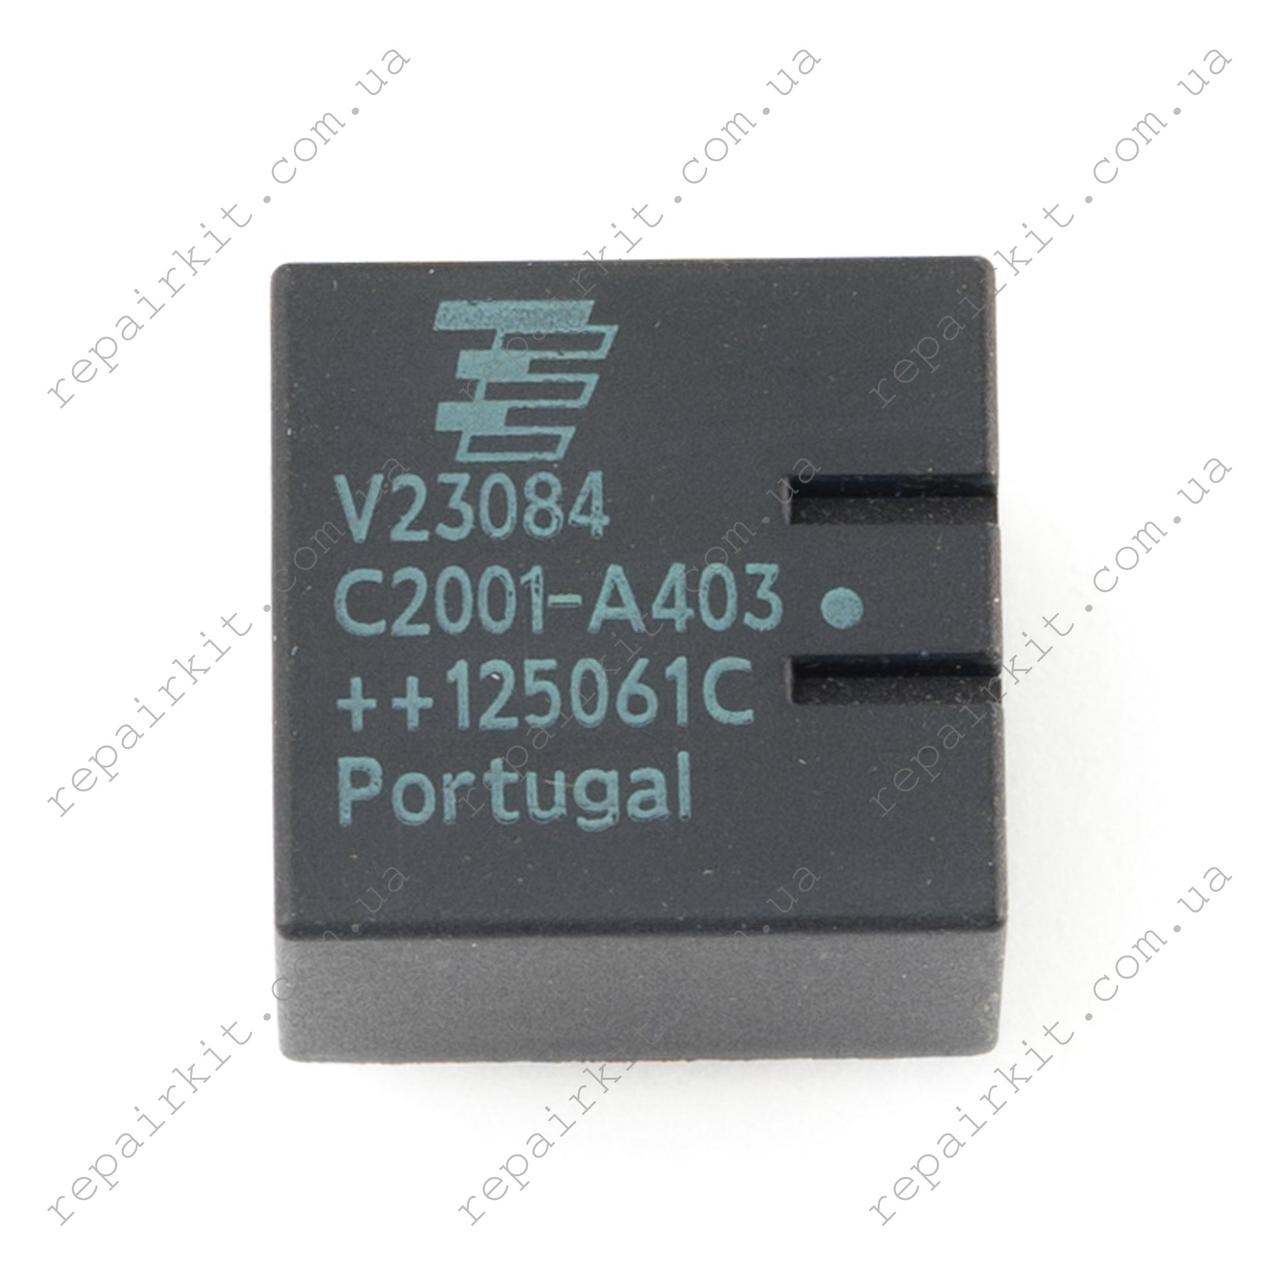 Реле Tyco V23084-C2001-A403